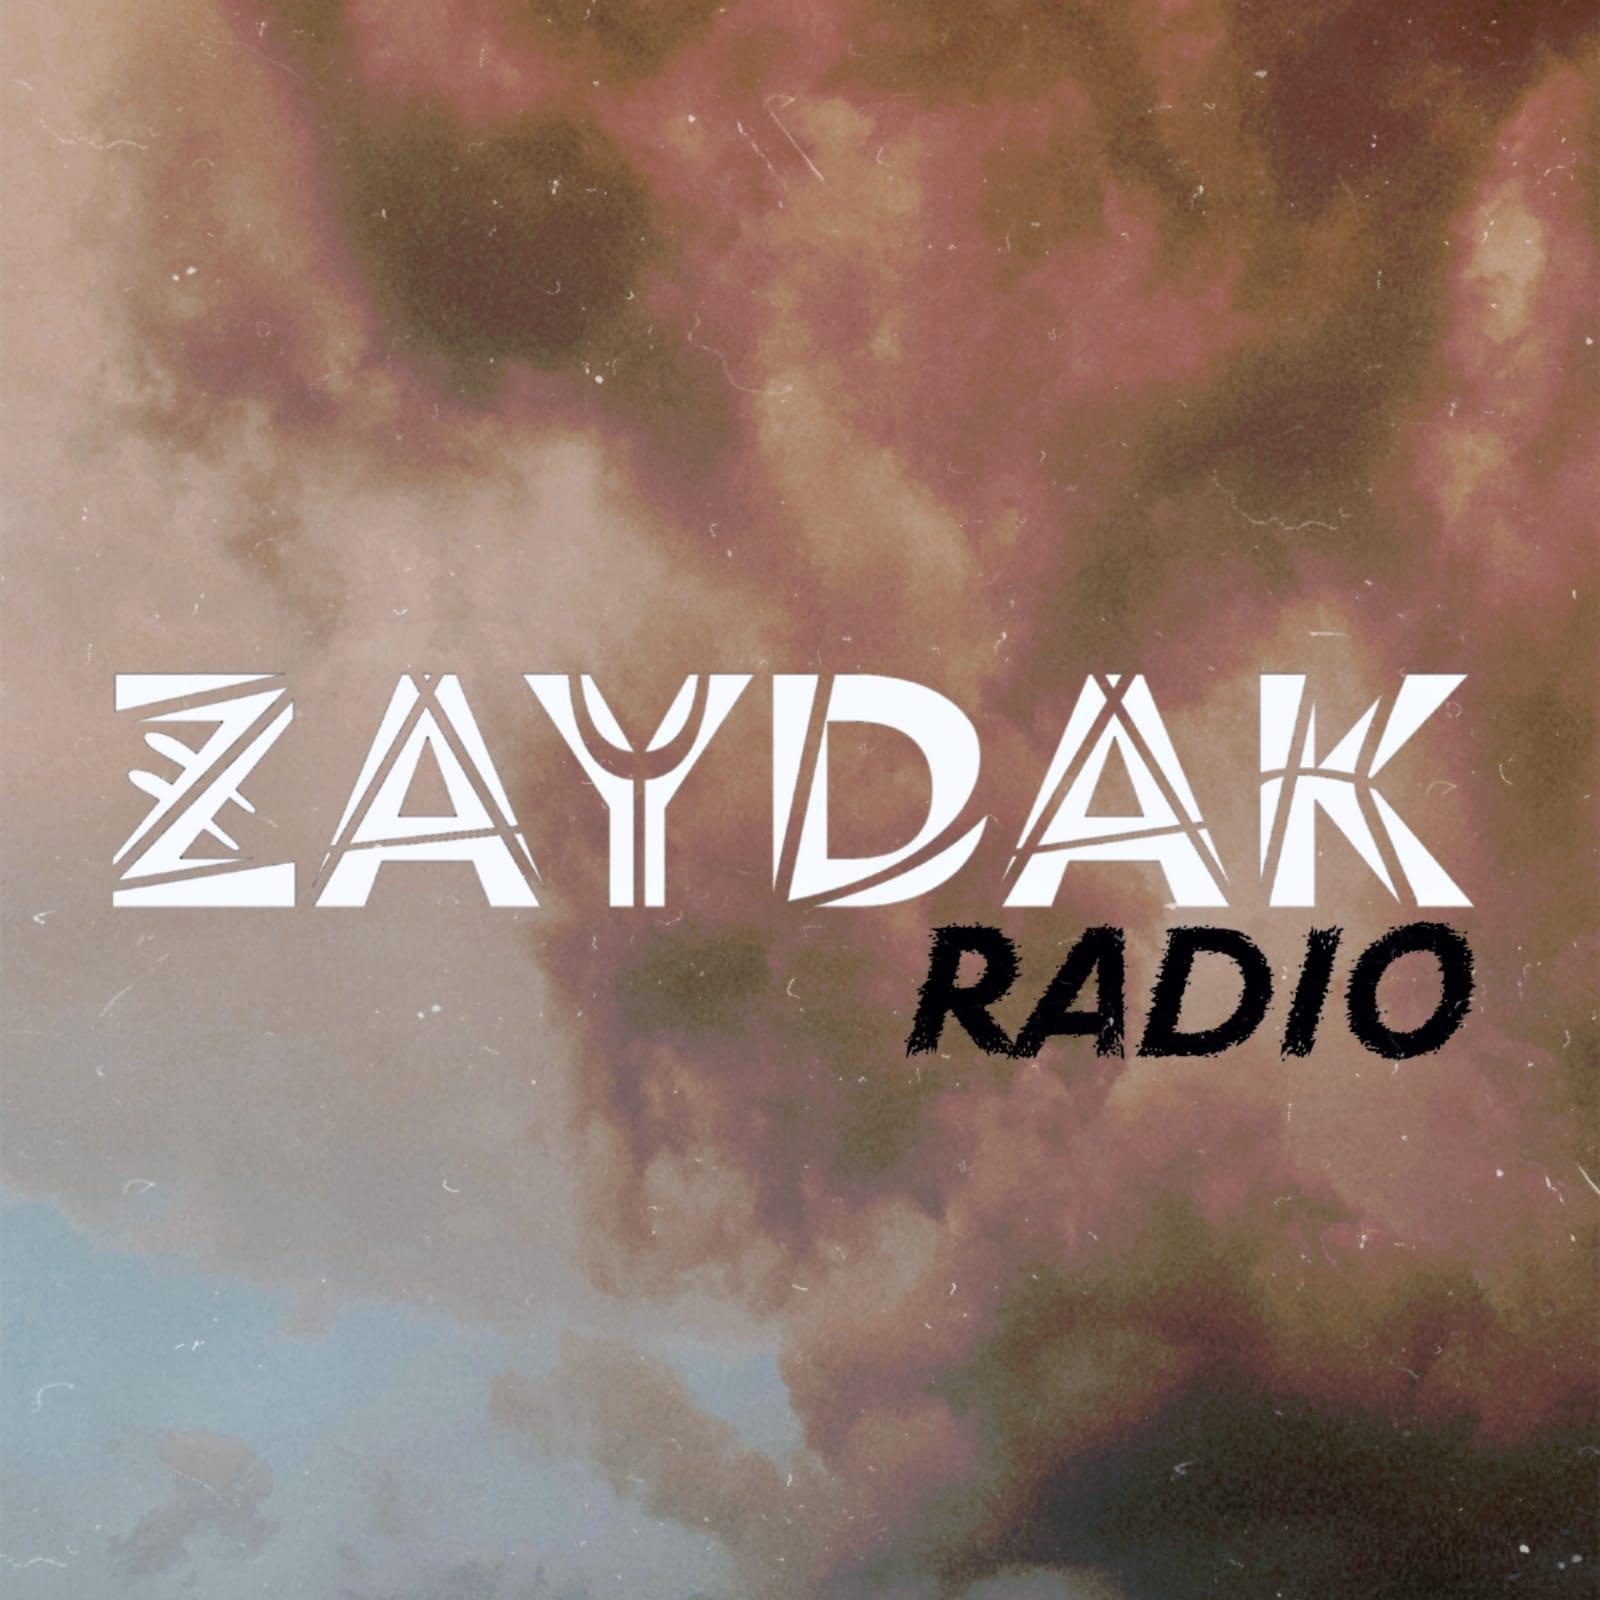 ZAYDAK RADIO